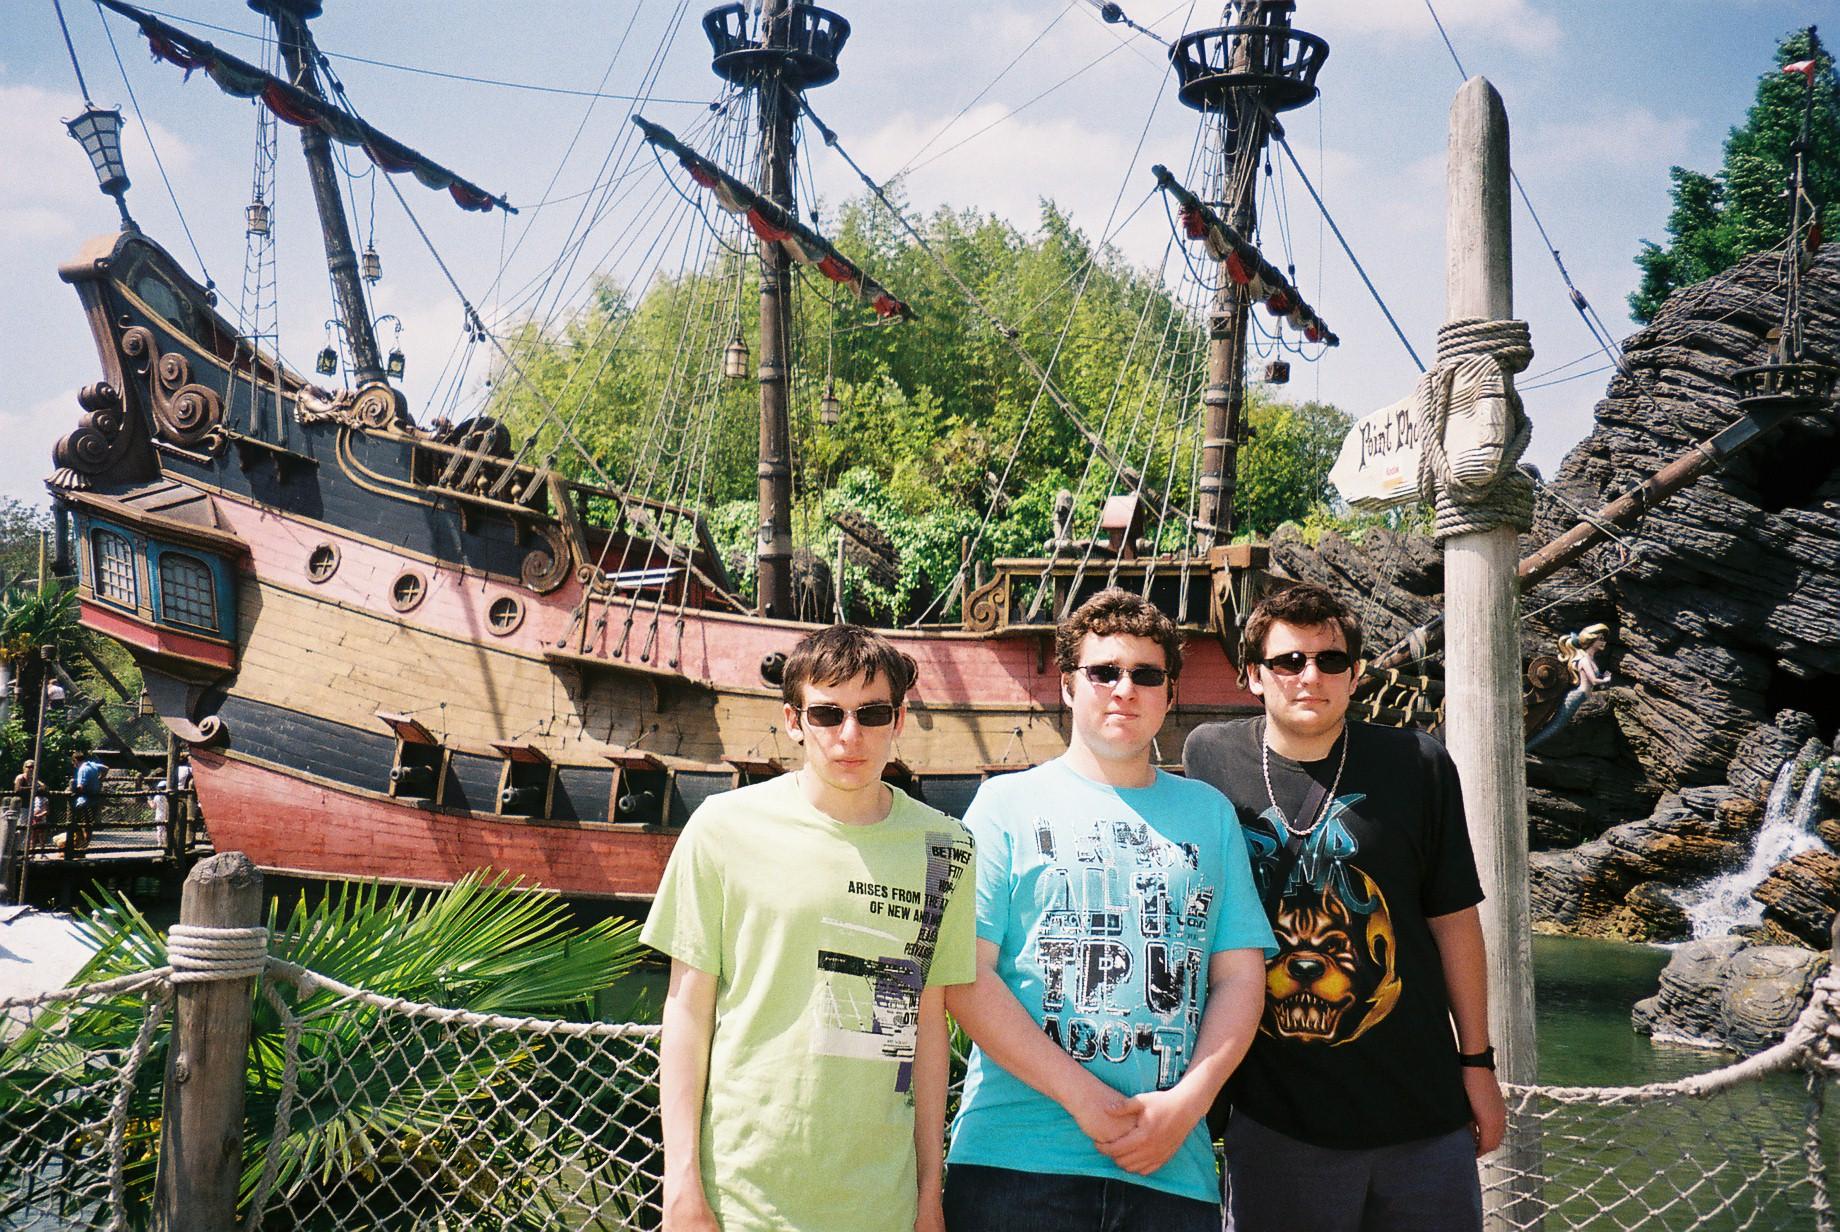 disneyland-pirates-of-caribbean-22mai10